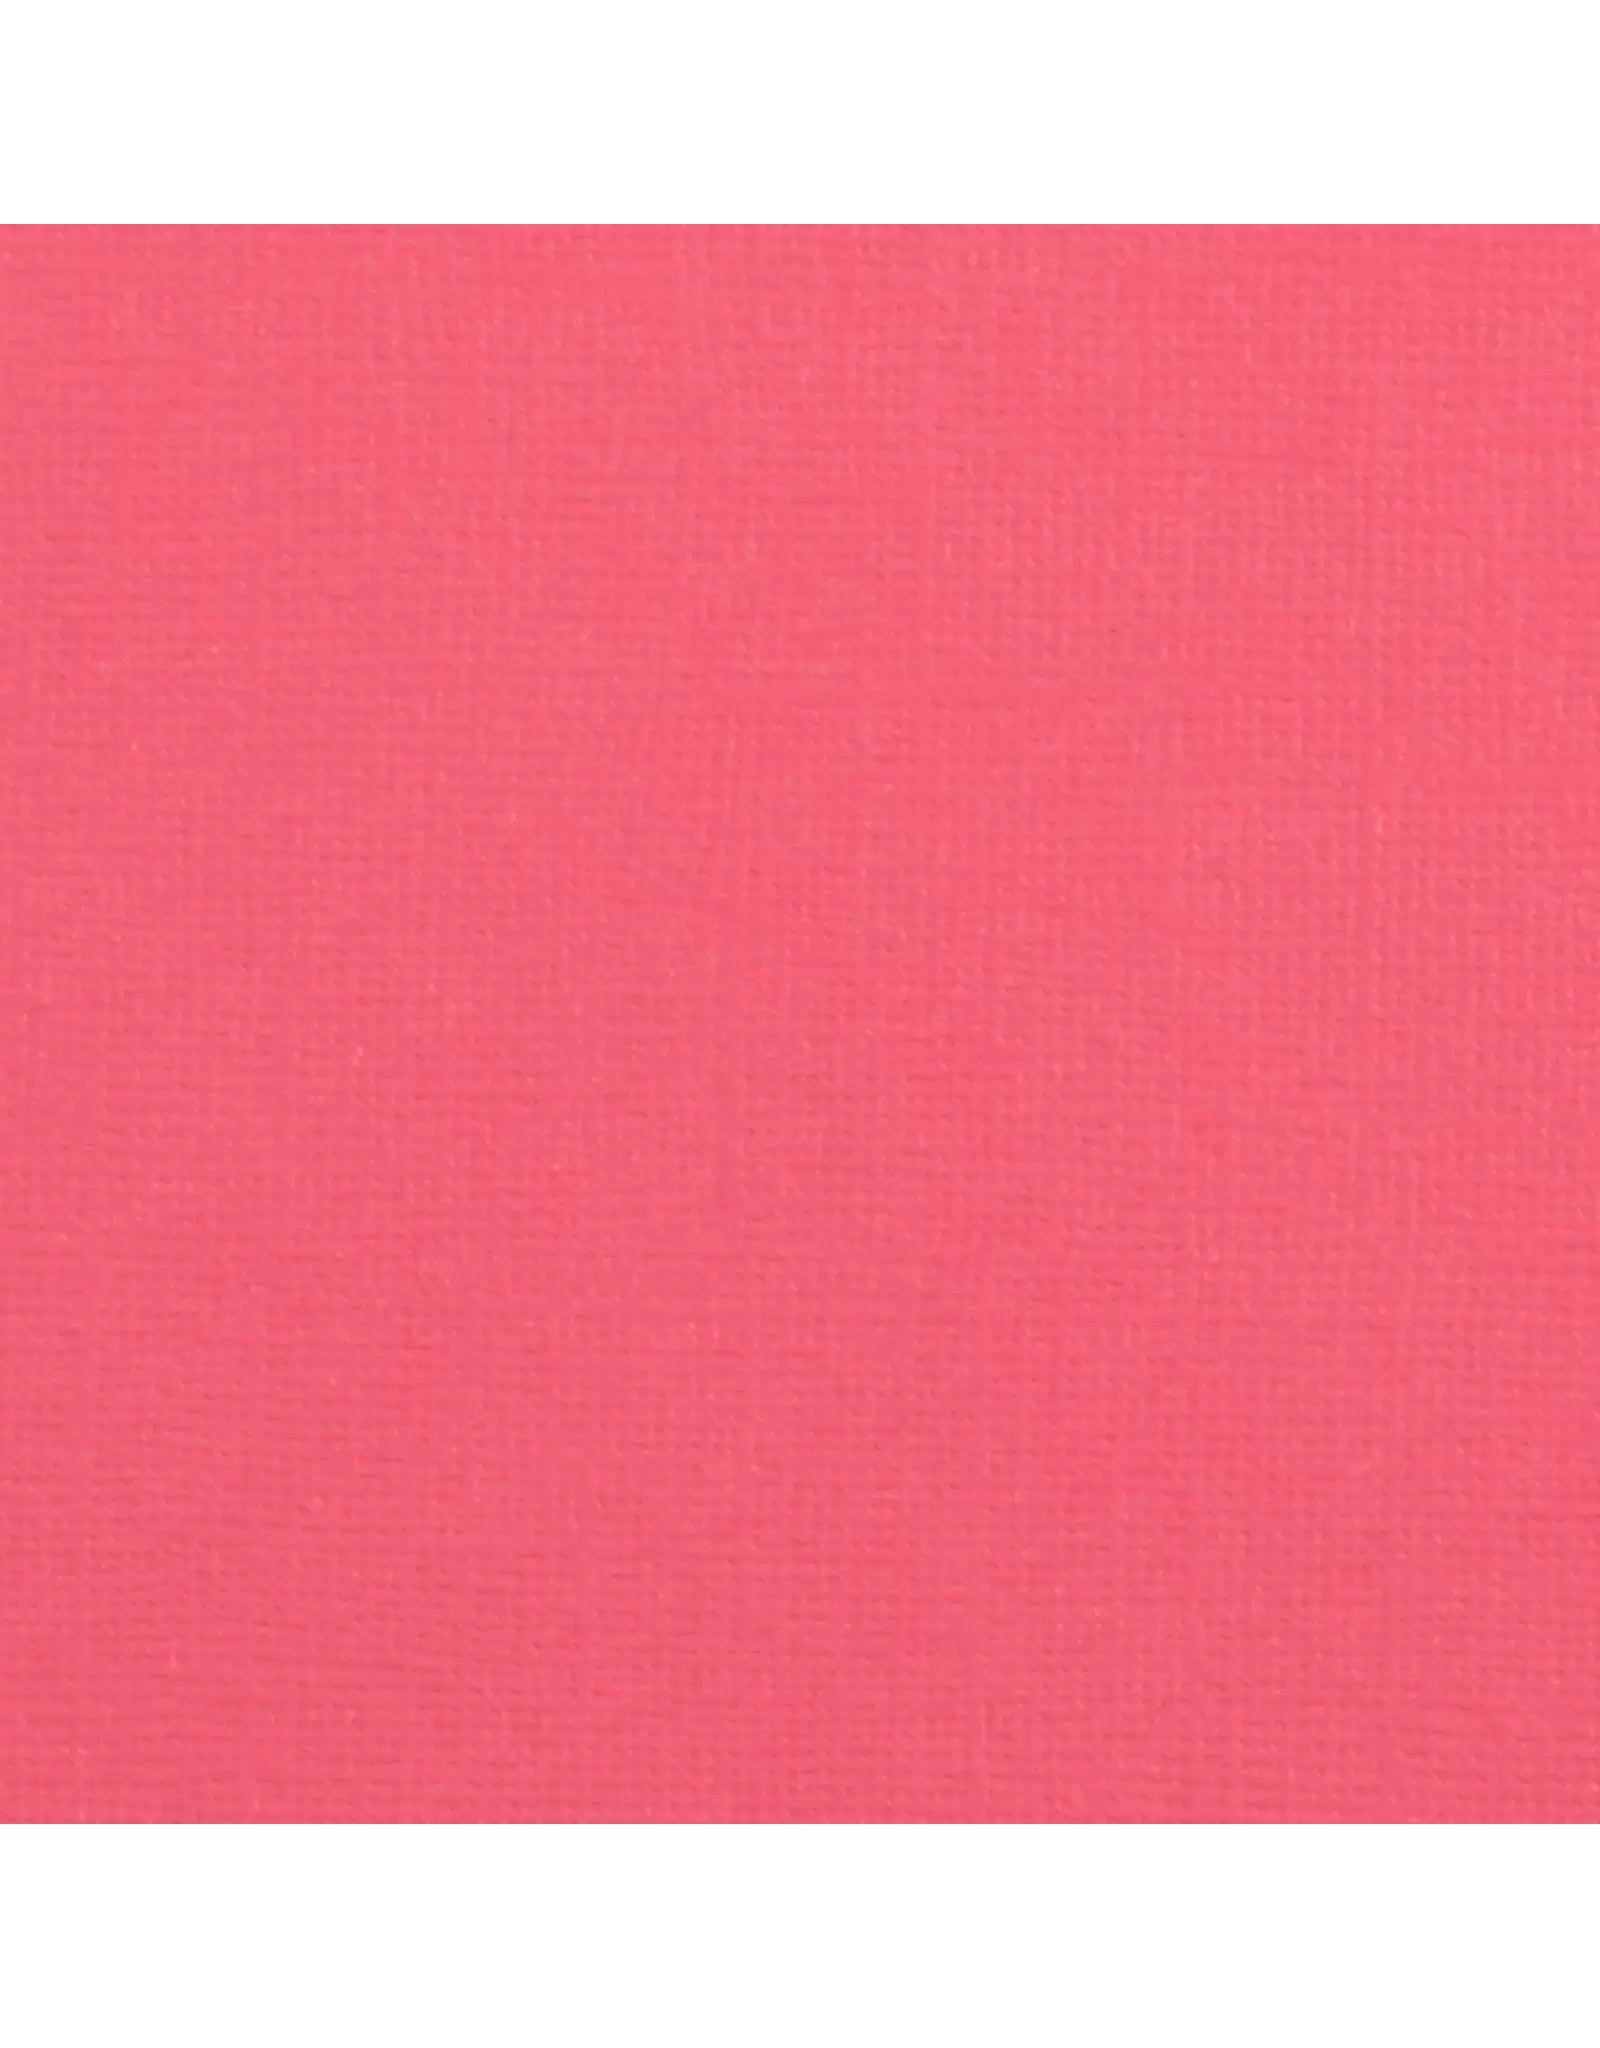 Vaessen Creative Florence • Cardstock texture 30,5x30,5cm Cupid